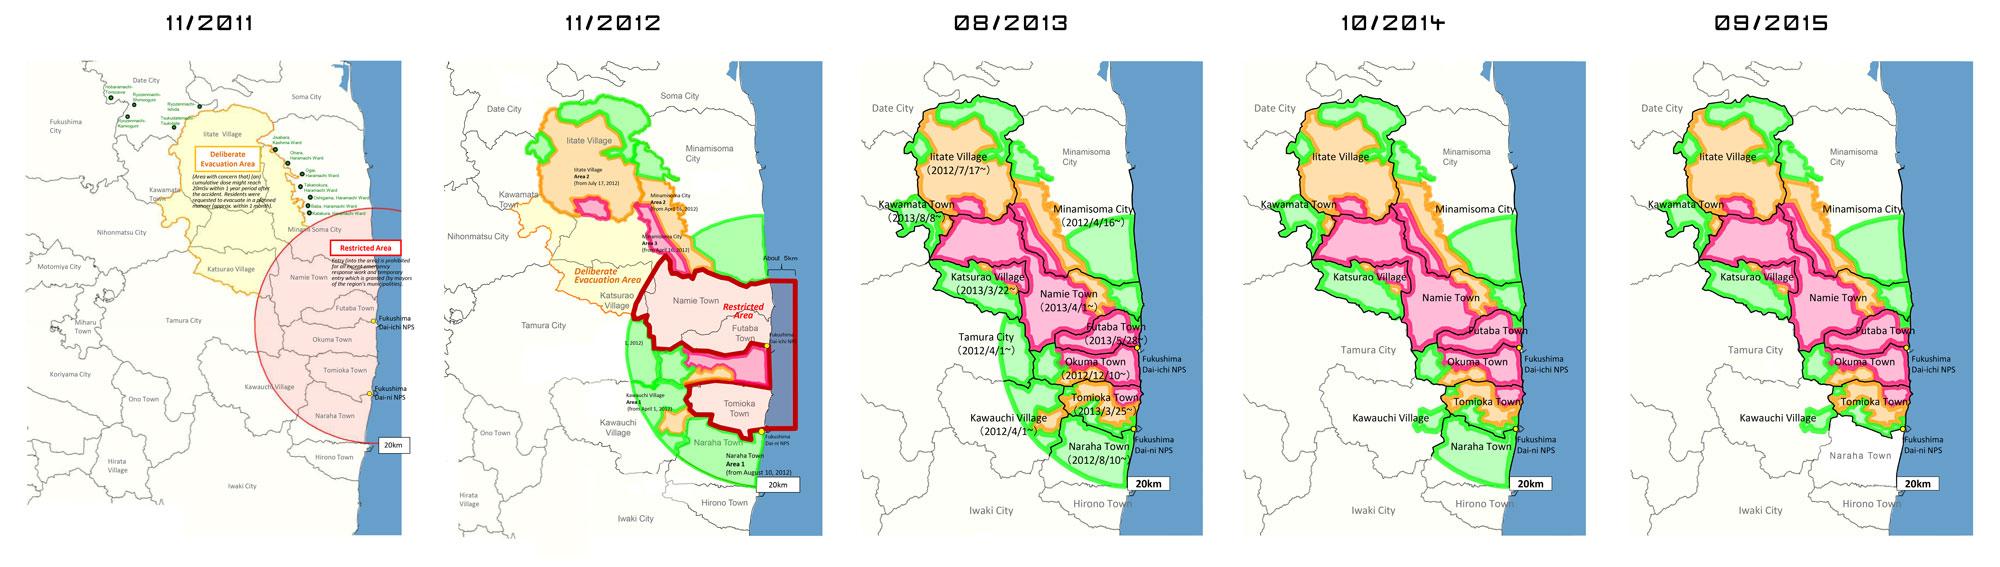 evacuation_map_2011_2015